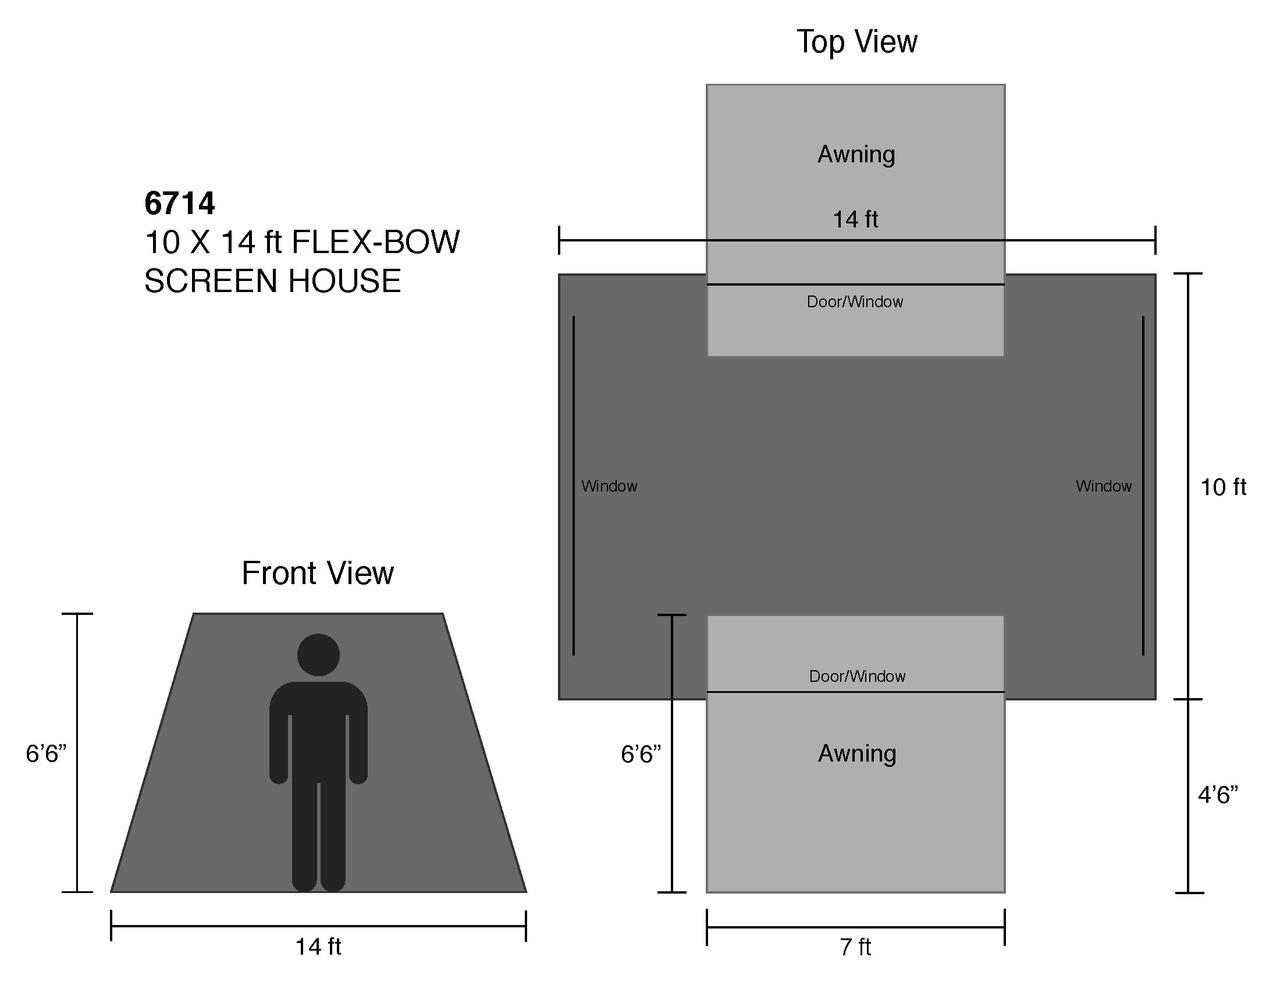 10 x 14 ft. Screen House